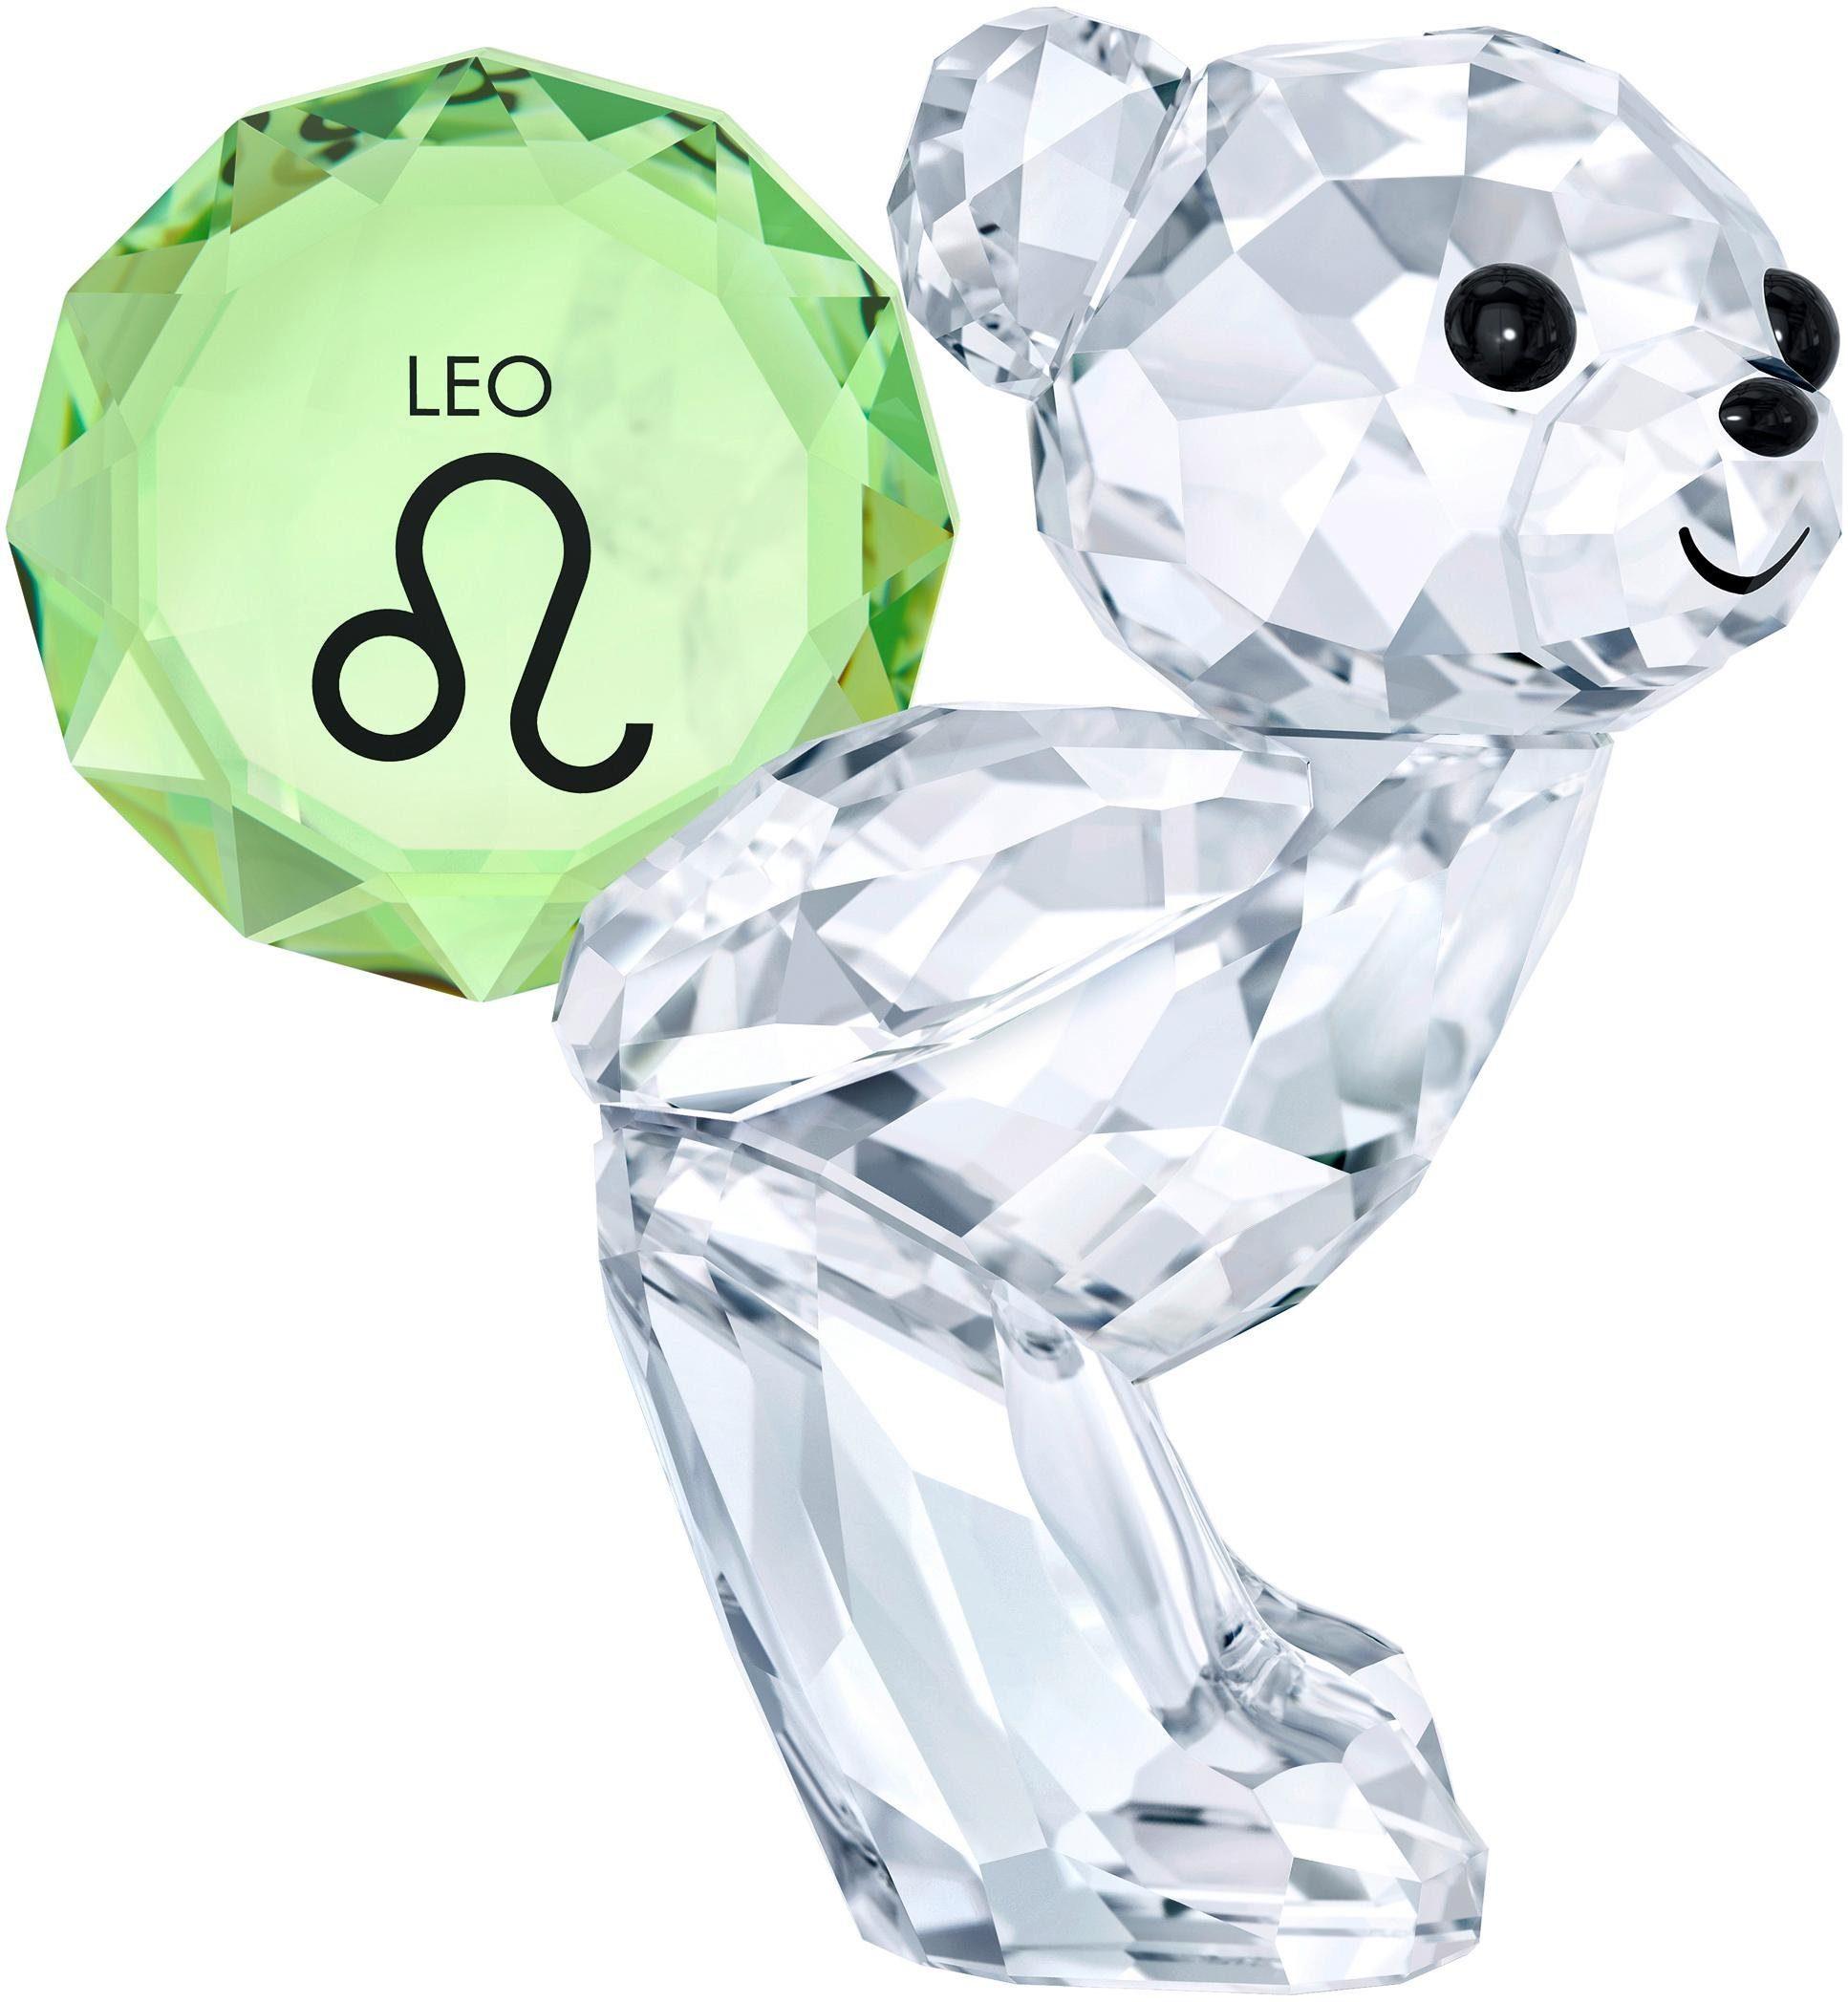 Swarovski Dekofigur »KRIS BEAR - LEO, 5396280« (1 Stück), Swarovski® Kristall